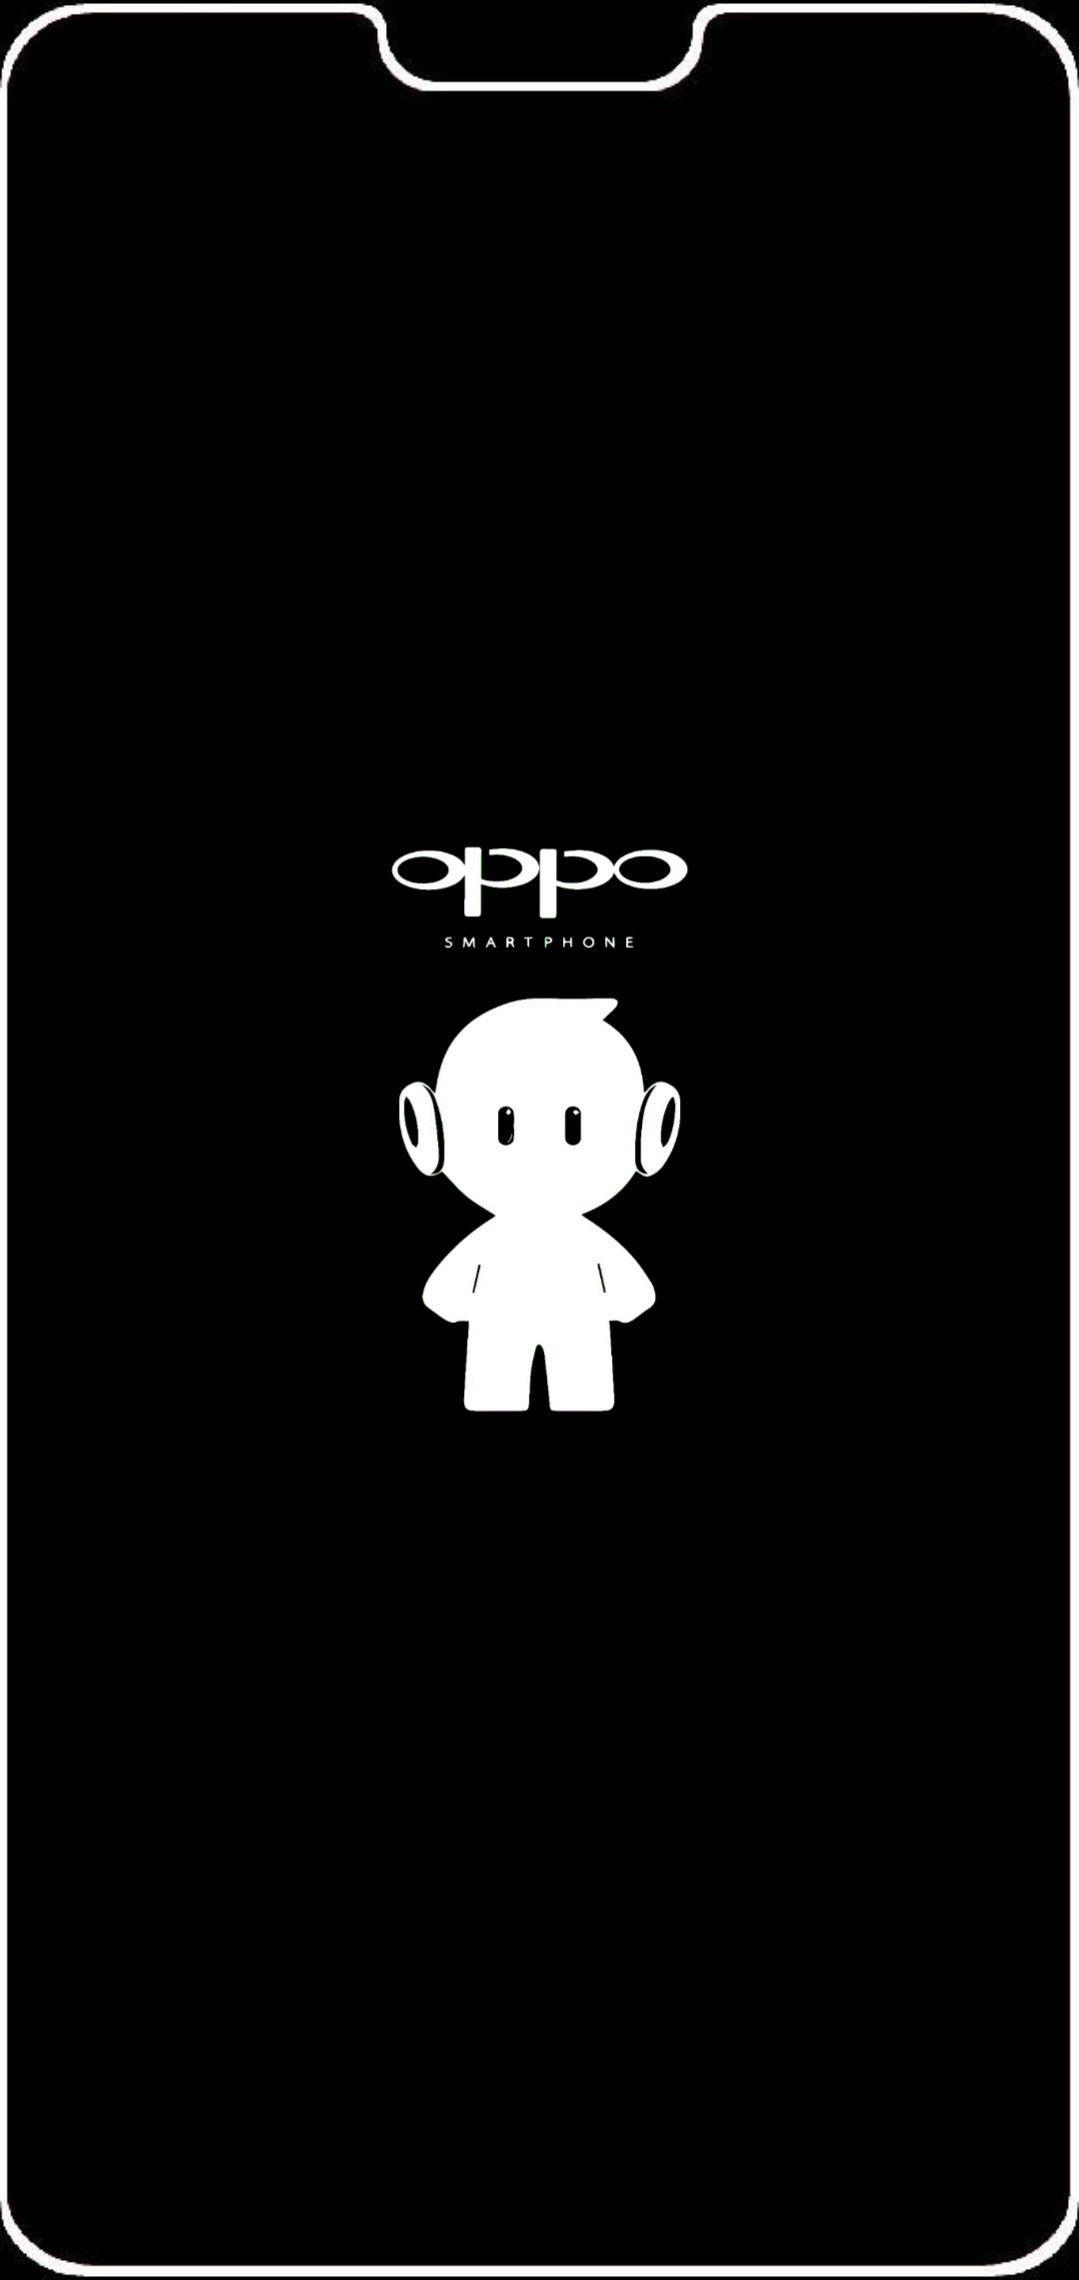 Oppo Black And White 1080x2280 Wallpaper Ponsel Fotografi Ponsel